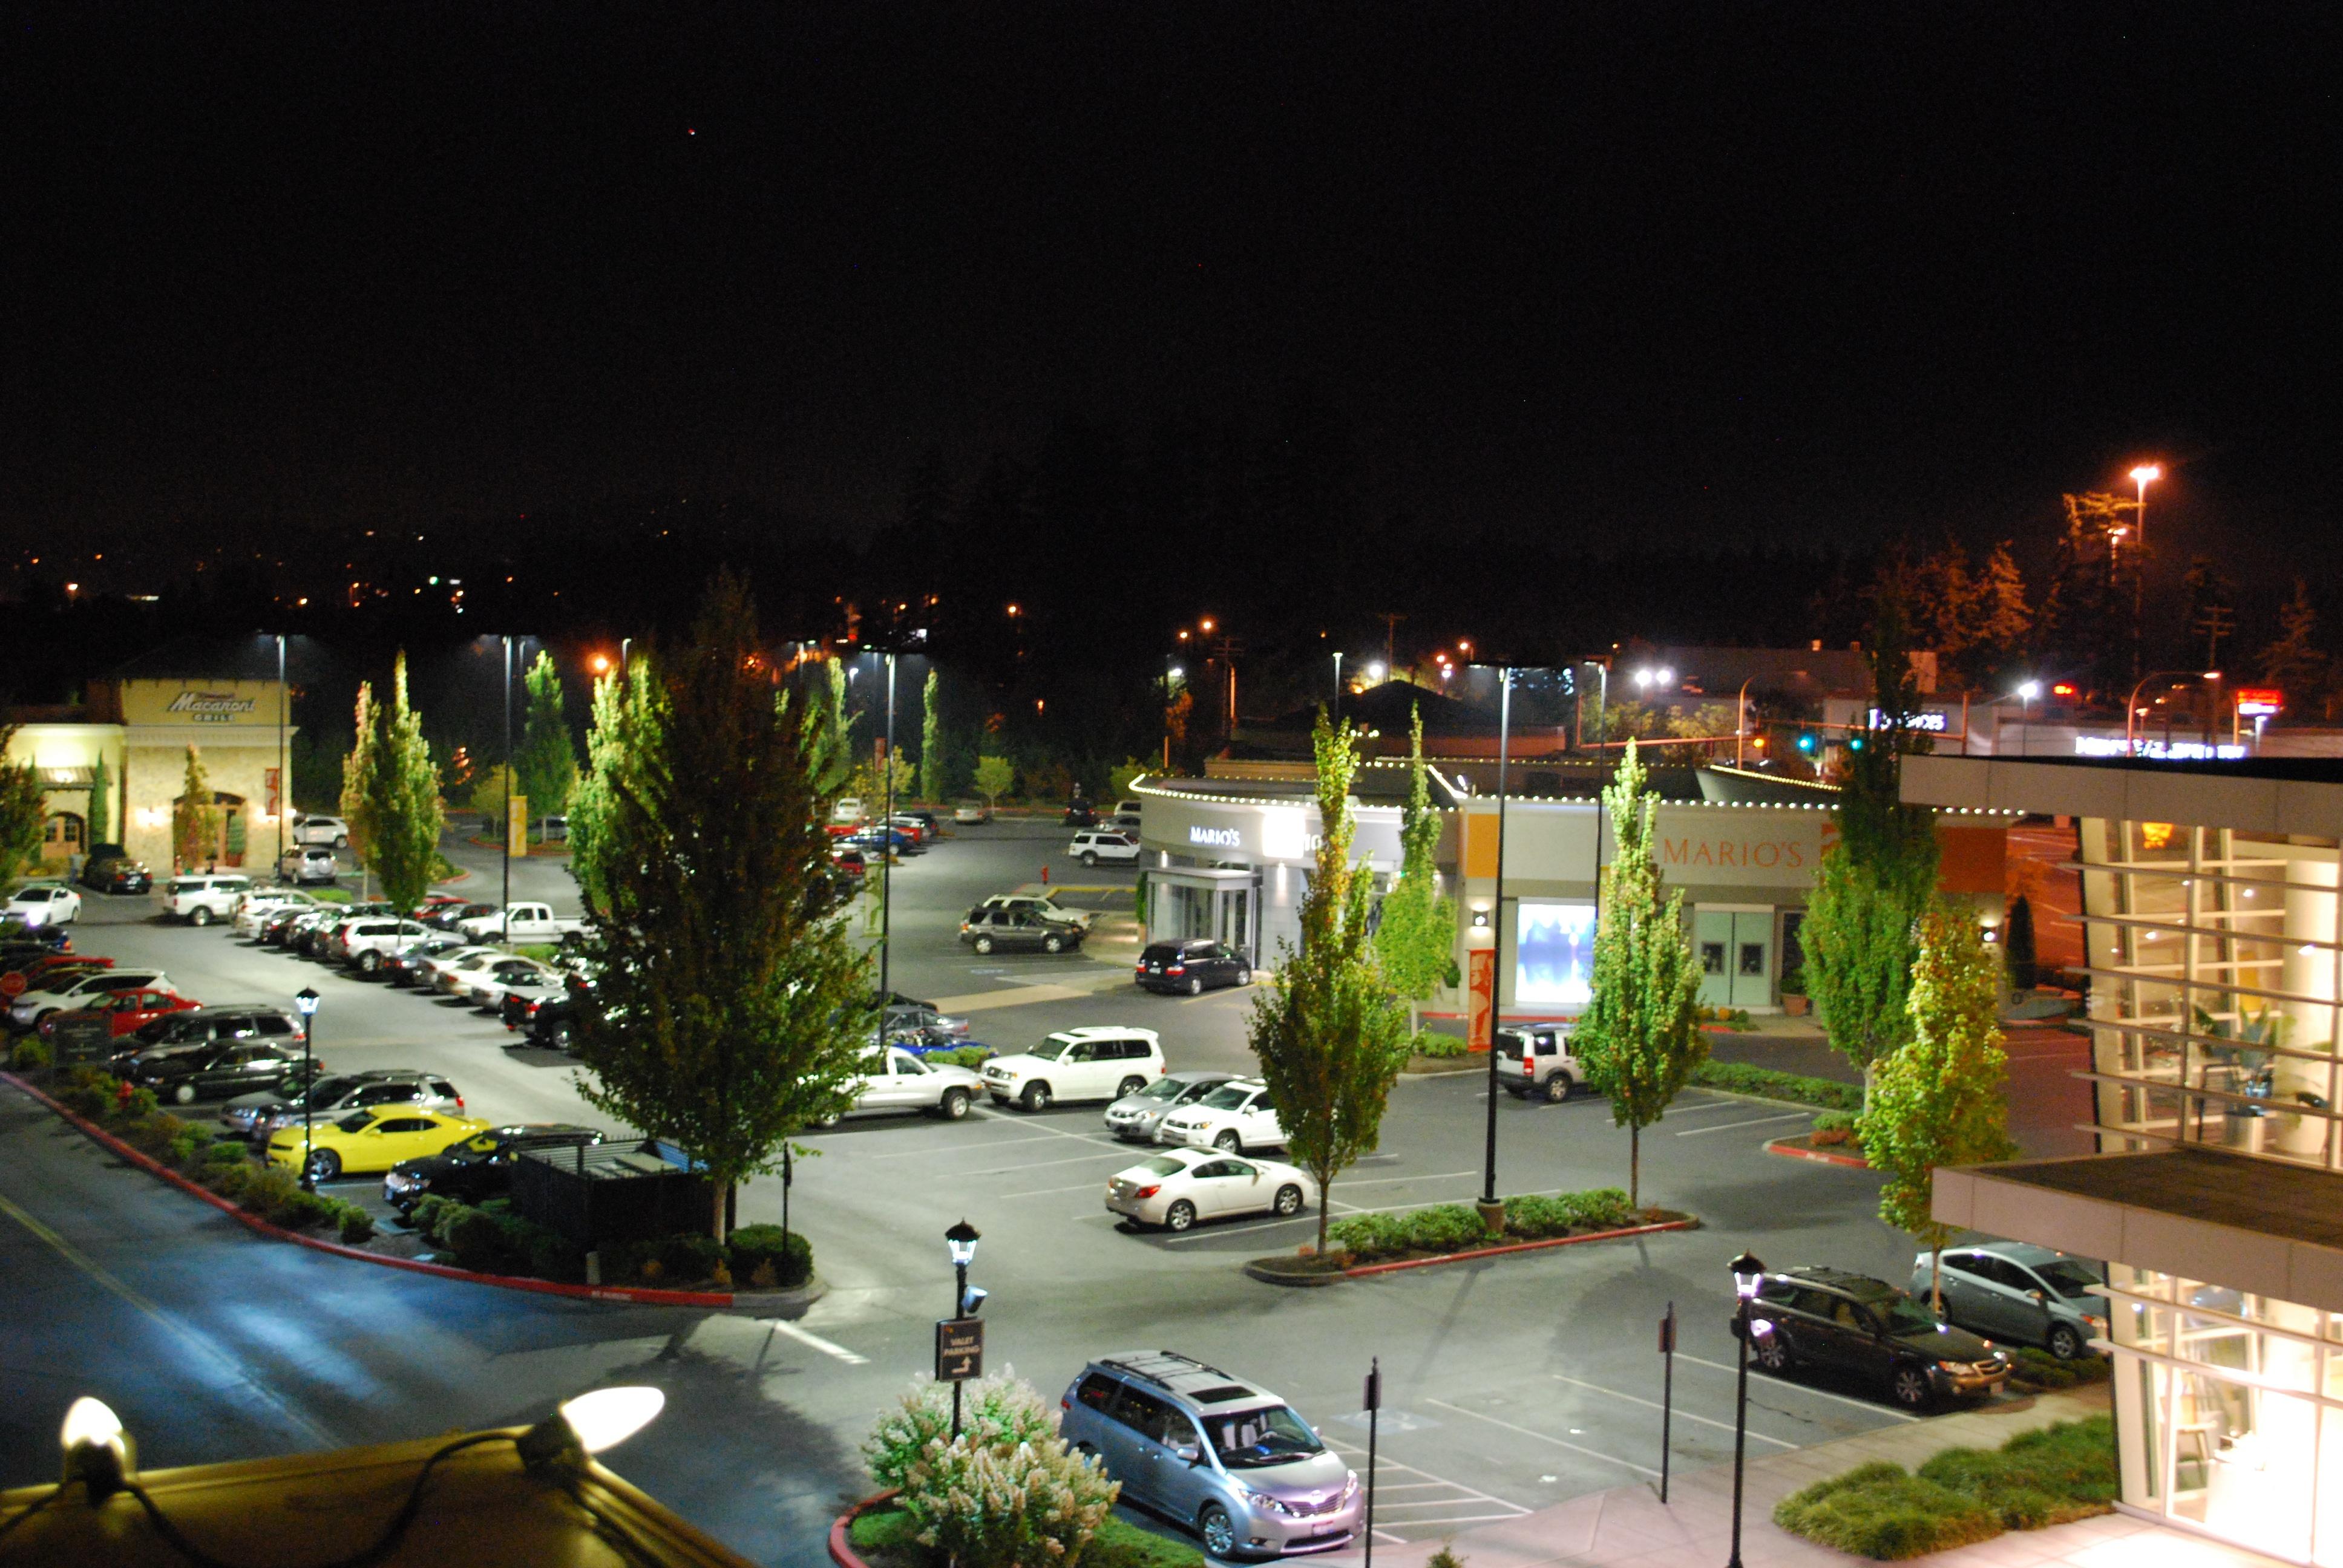 Bridgeport Village 254 Watt LED